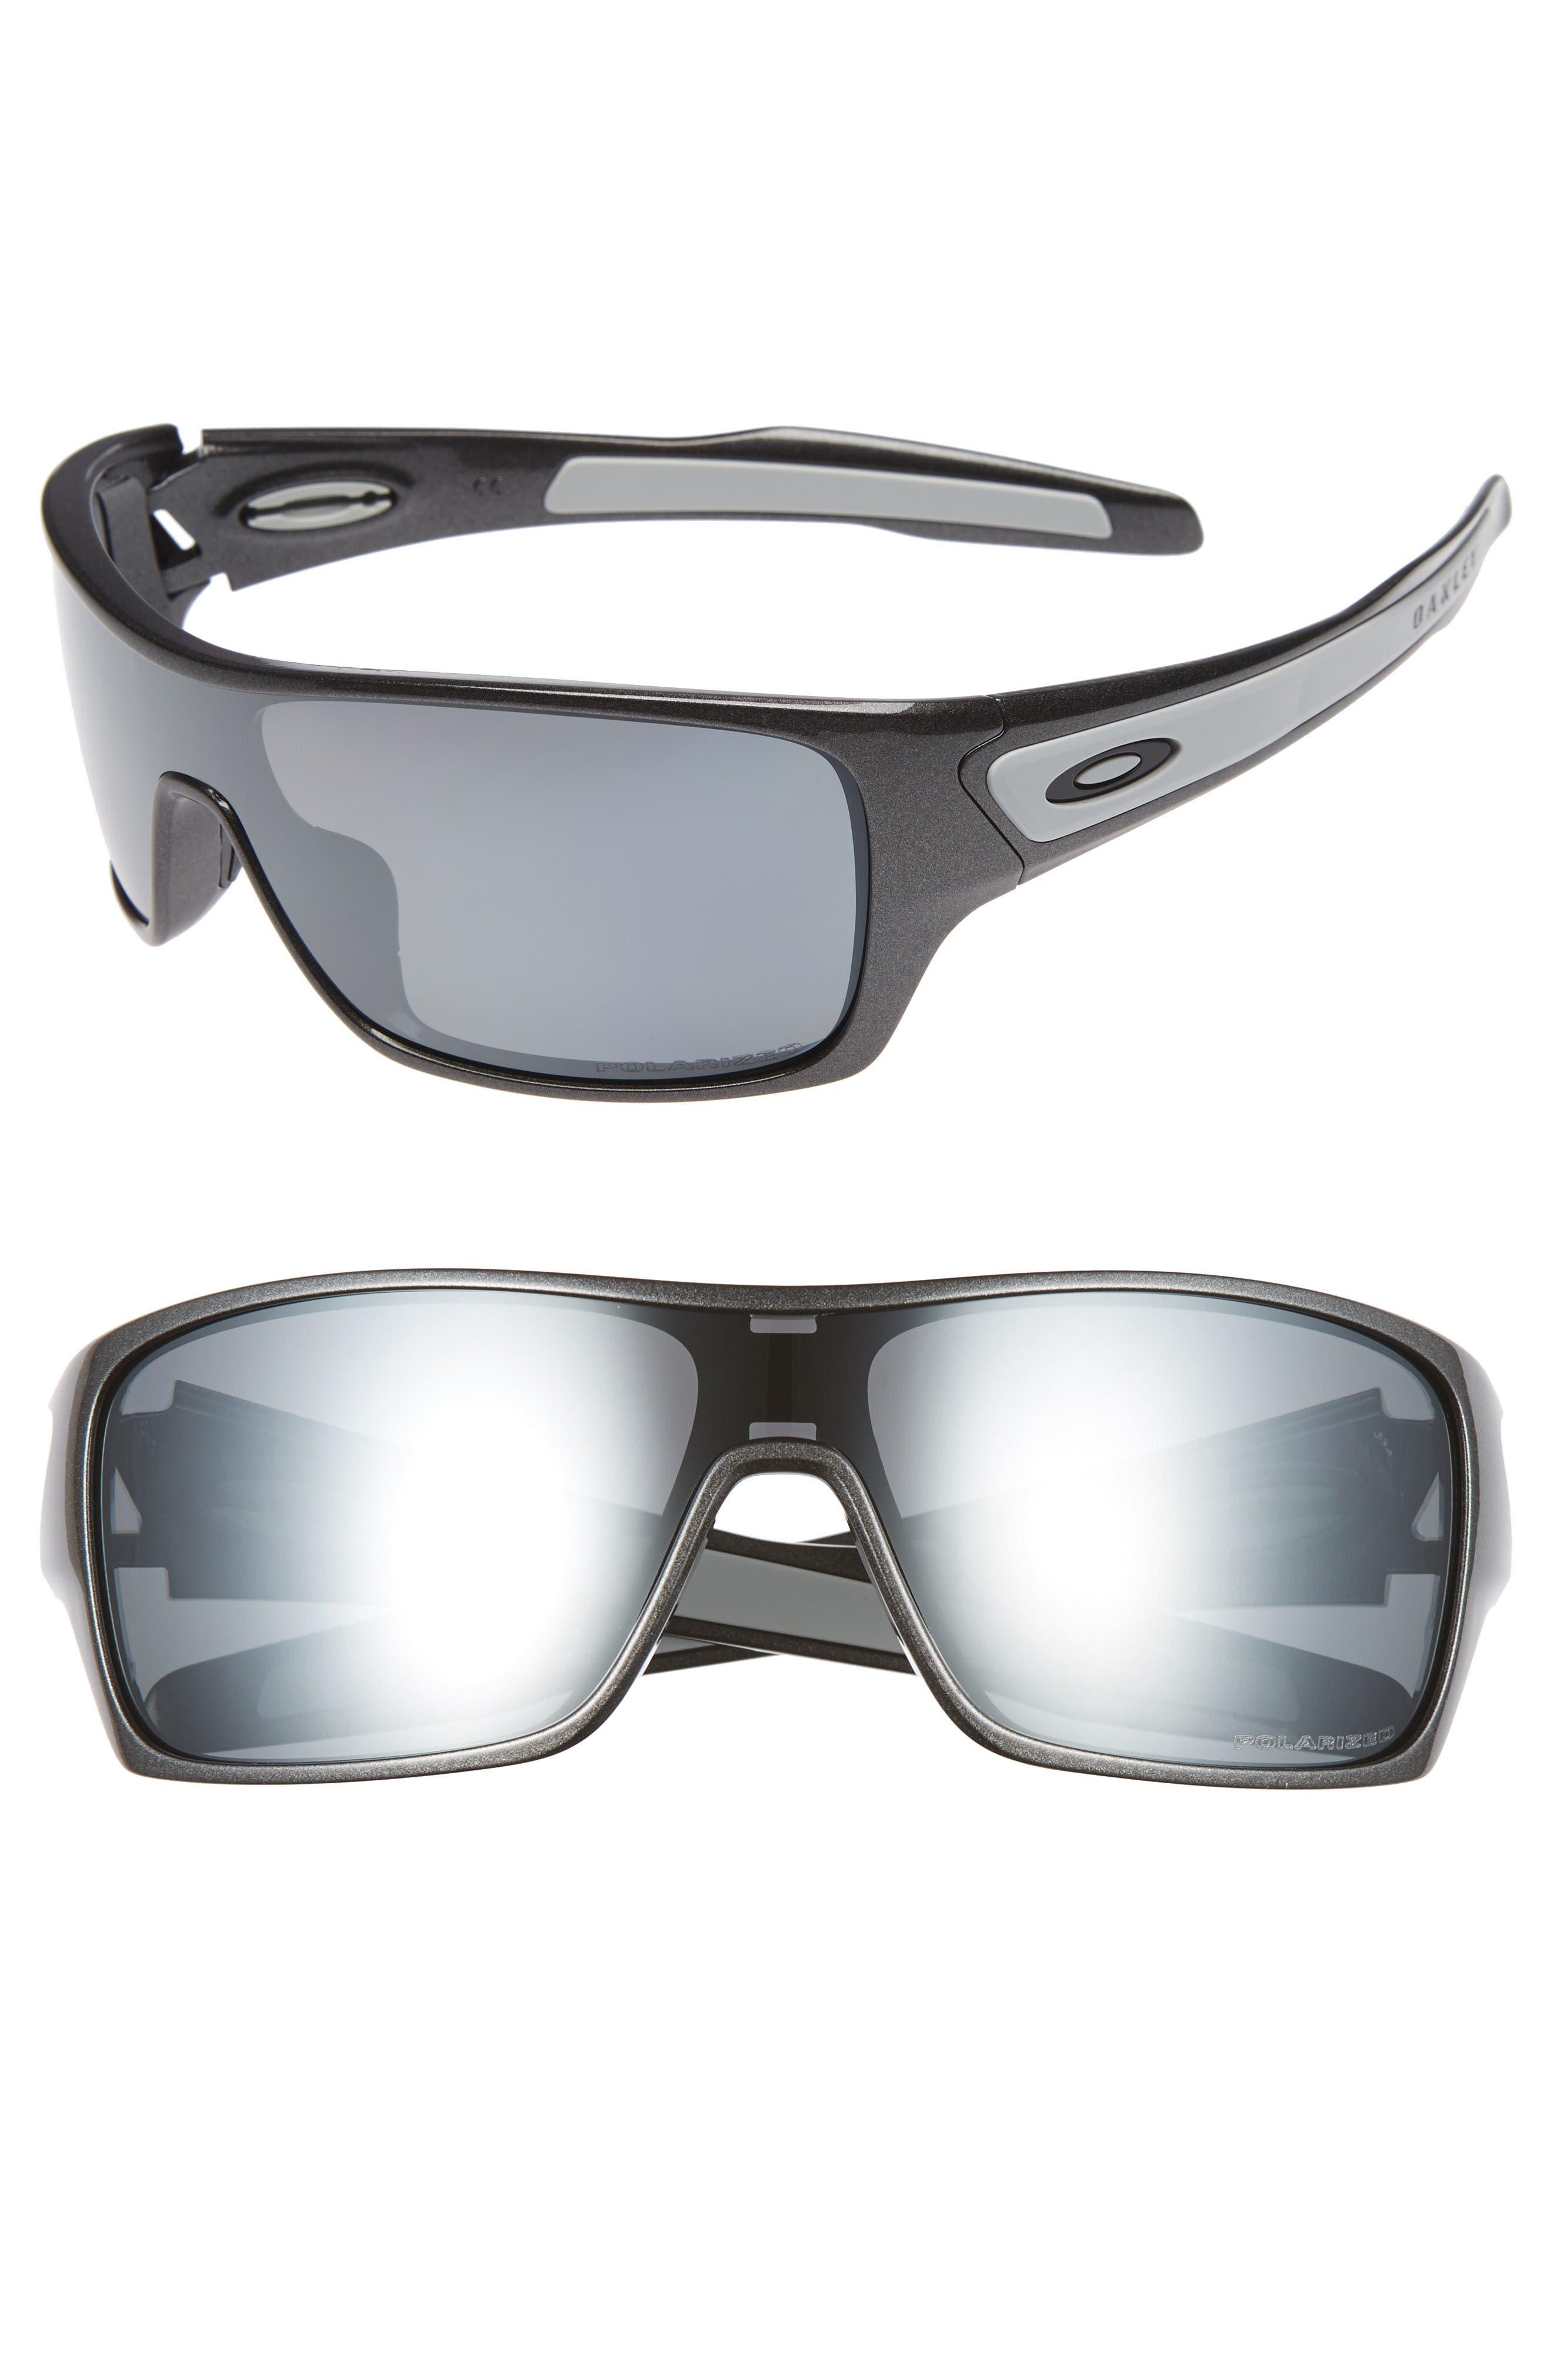 Turbine Rotor 63mm Polarized Sunglasses,                             Main thumbnail 1, color,                             Grey